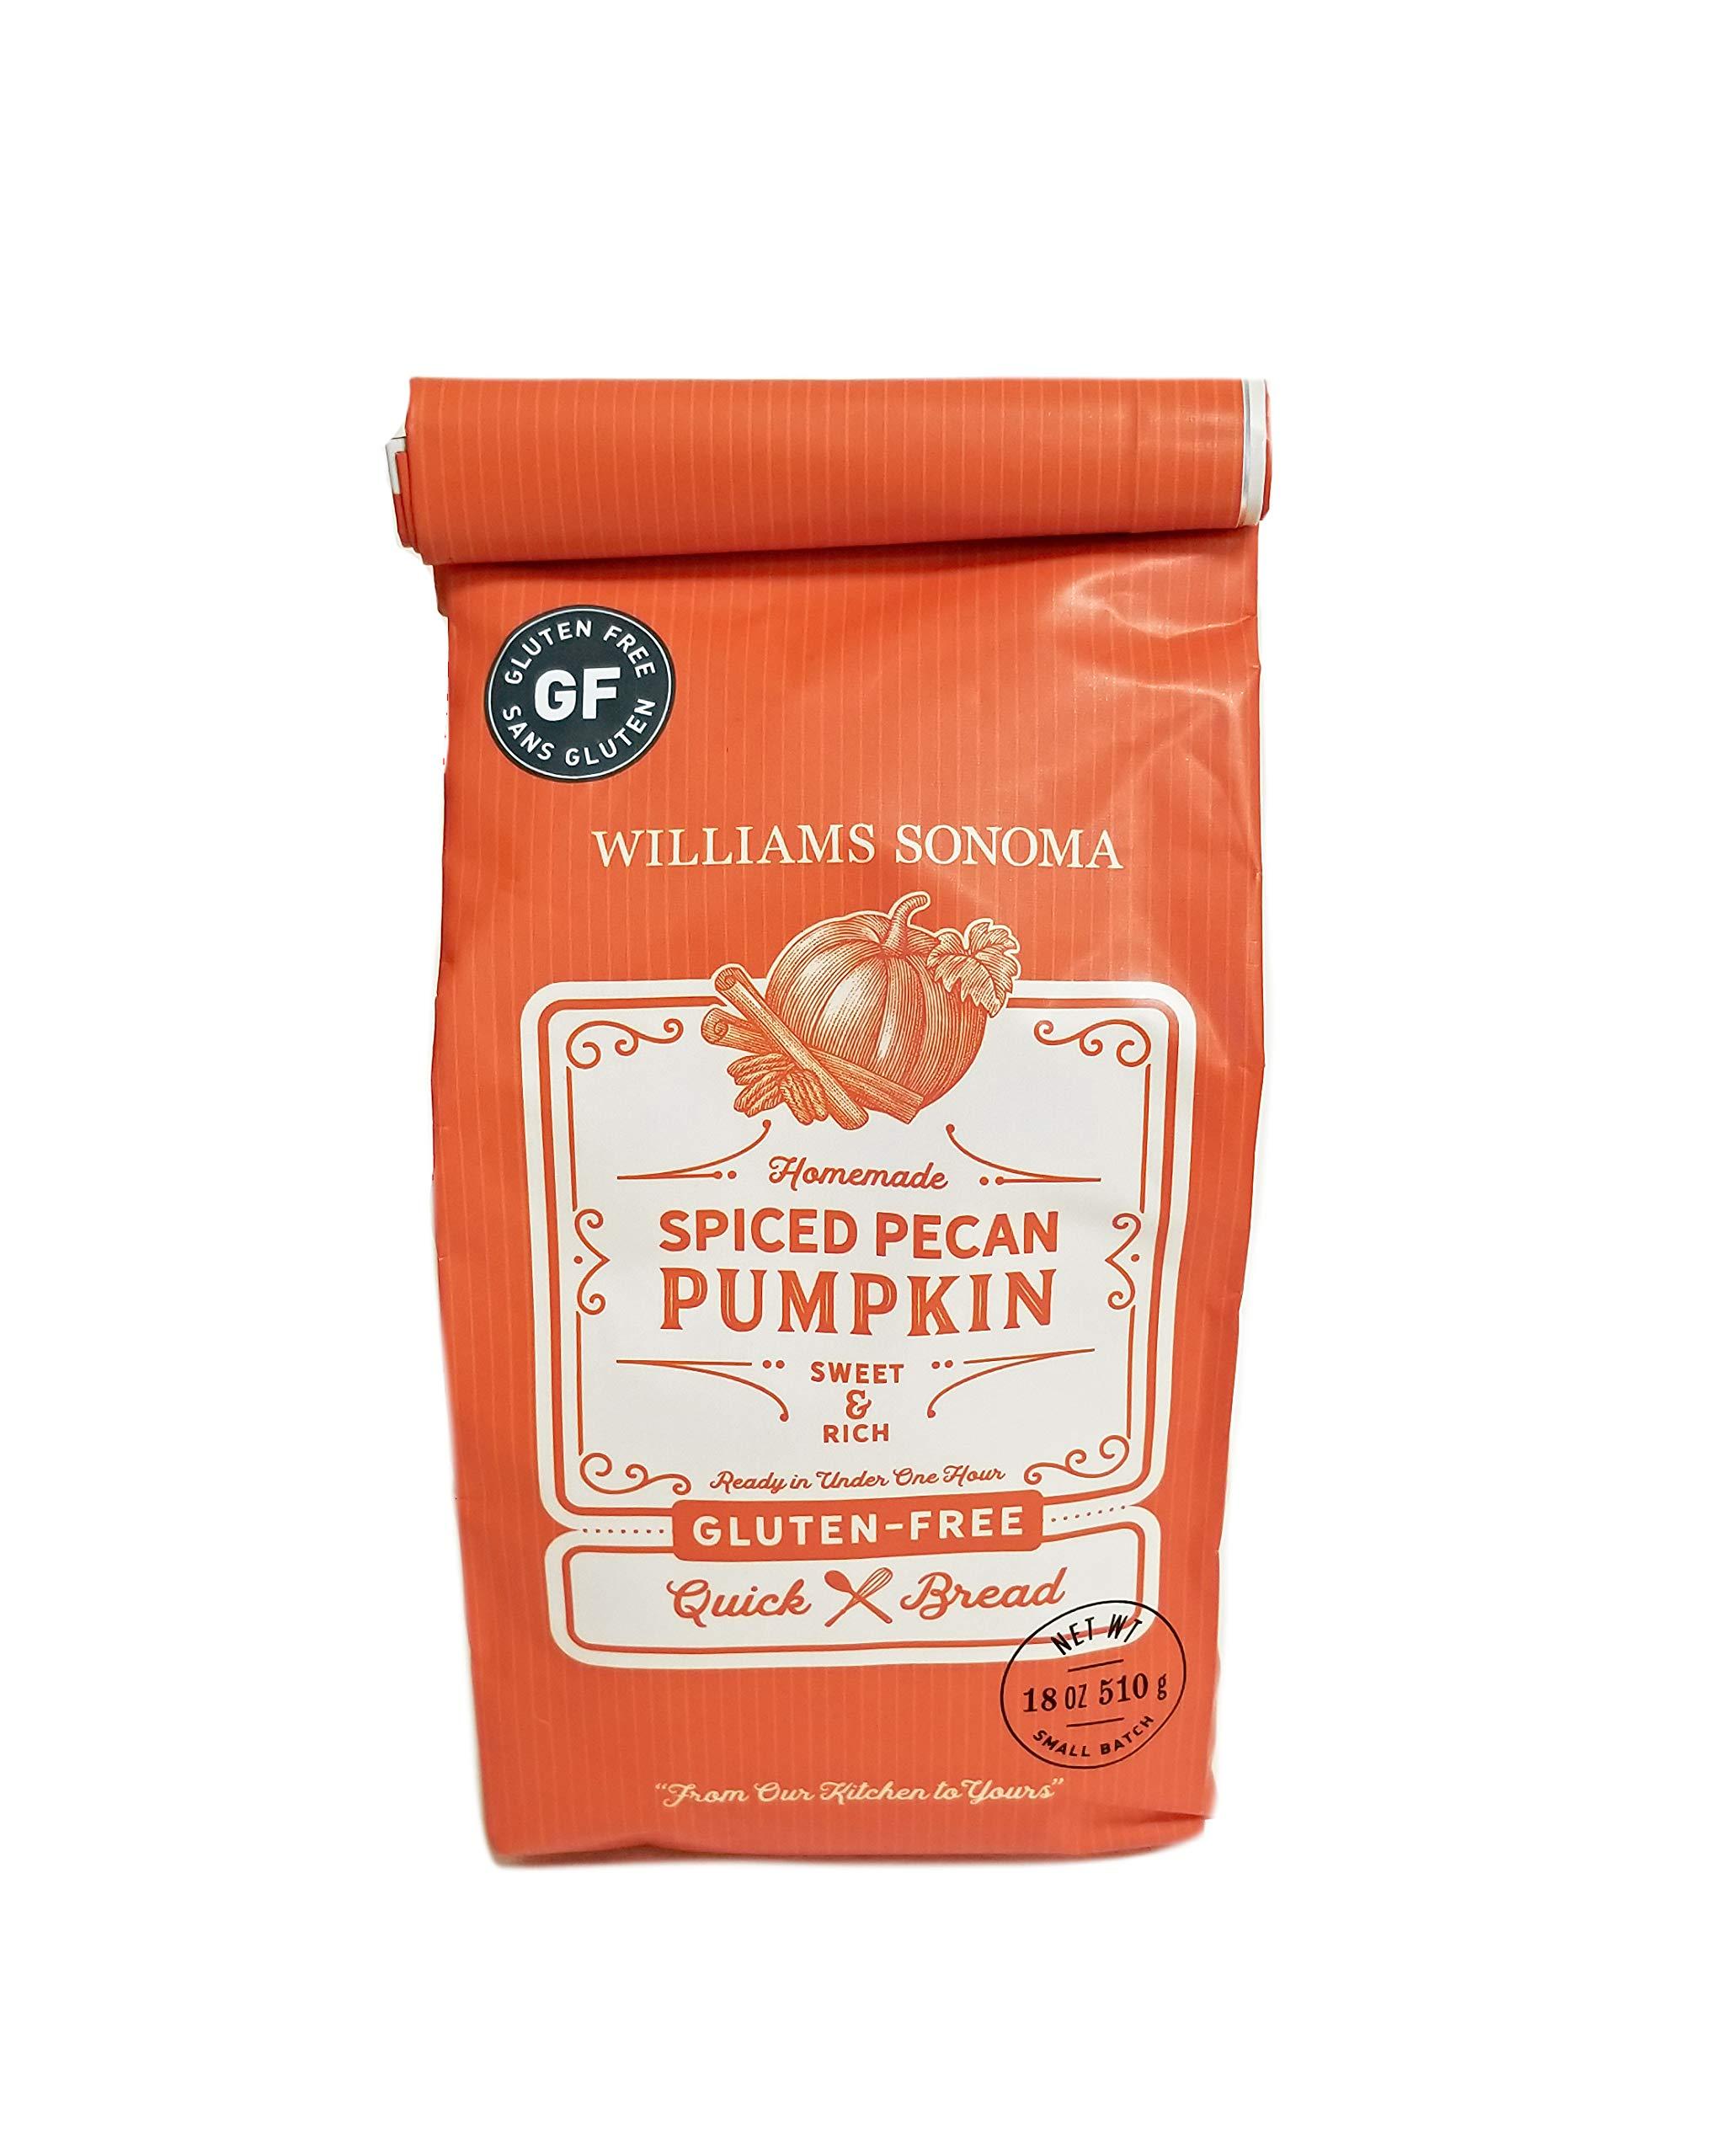 Williams Sonoma (Gluten-Free) Spiced Pecan Pumpkin Quick Bread Mix - 18 oz (ONE COUNT) by FCV